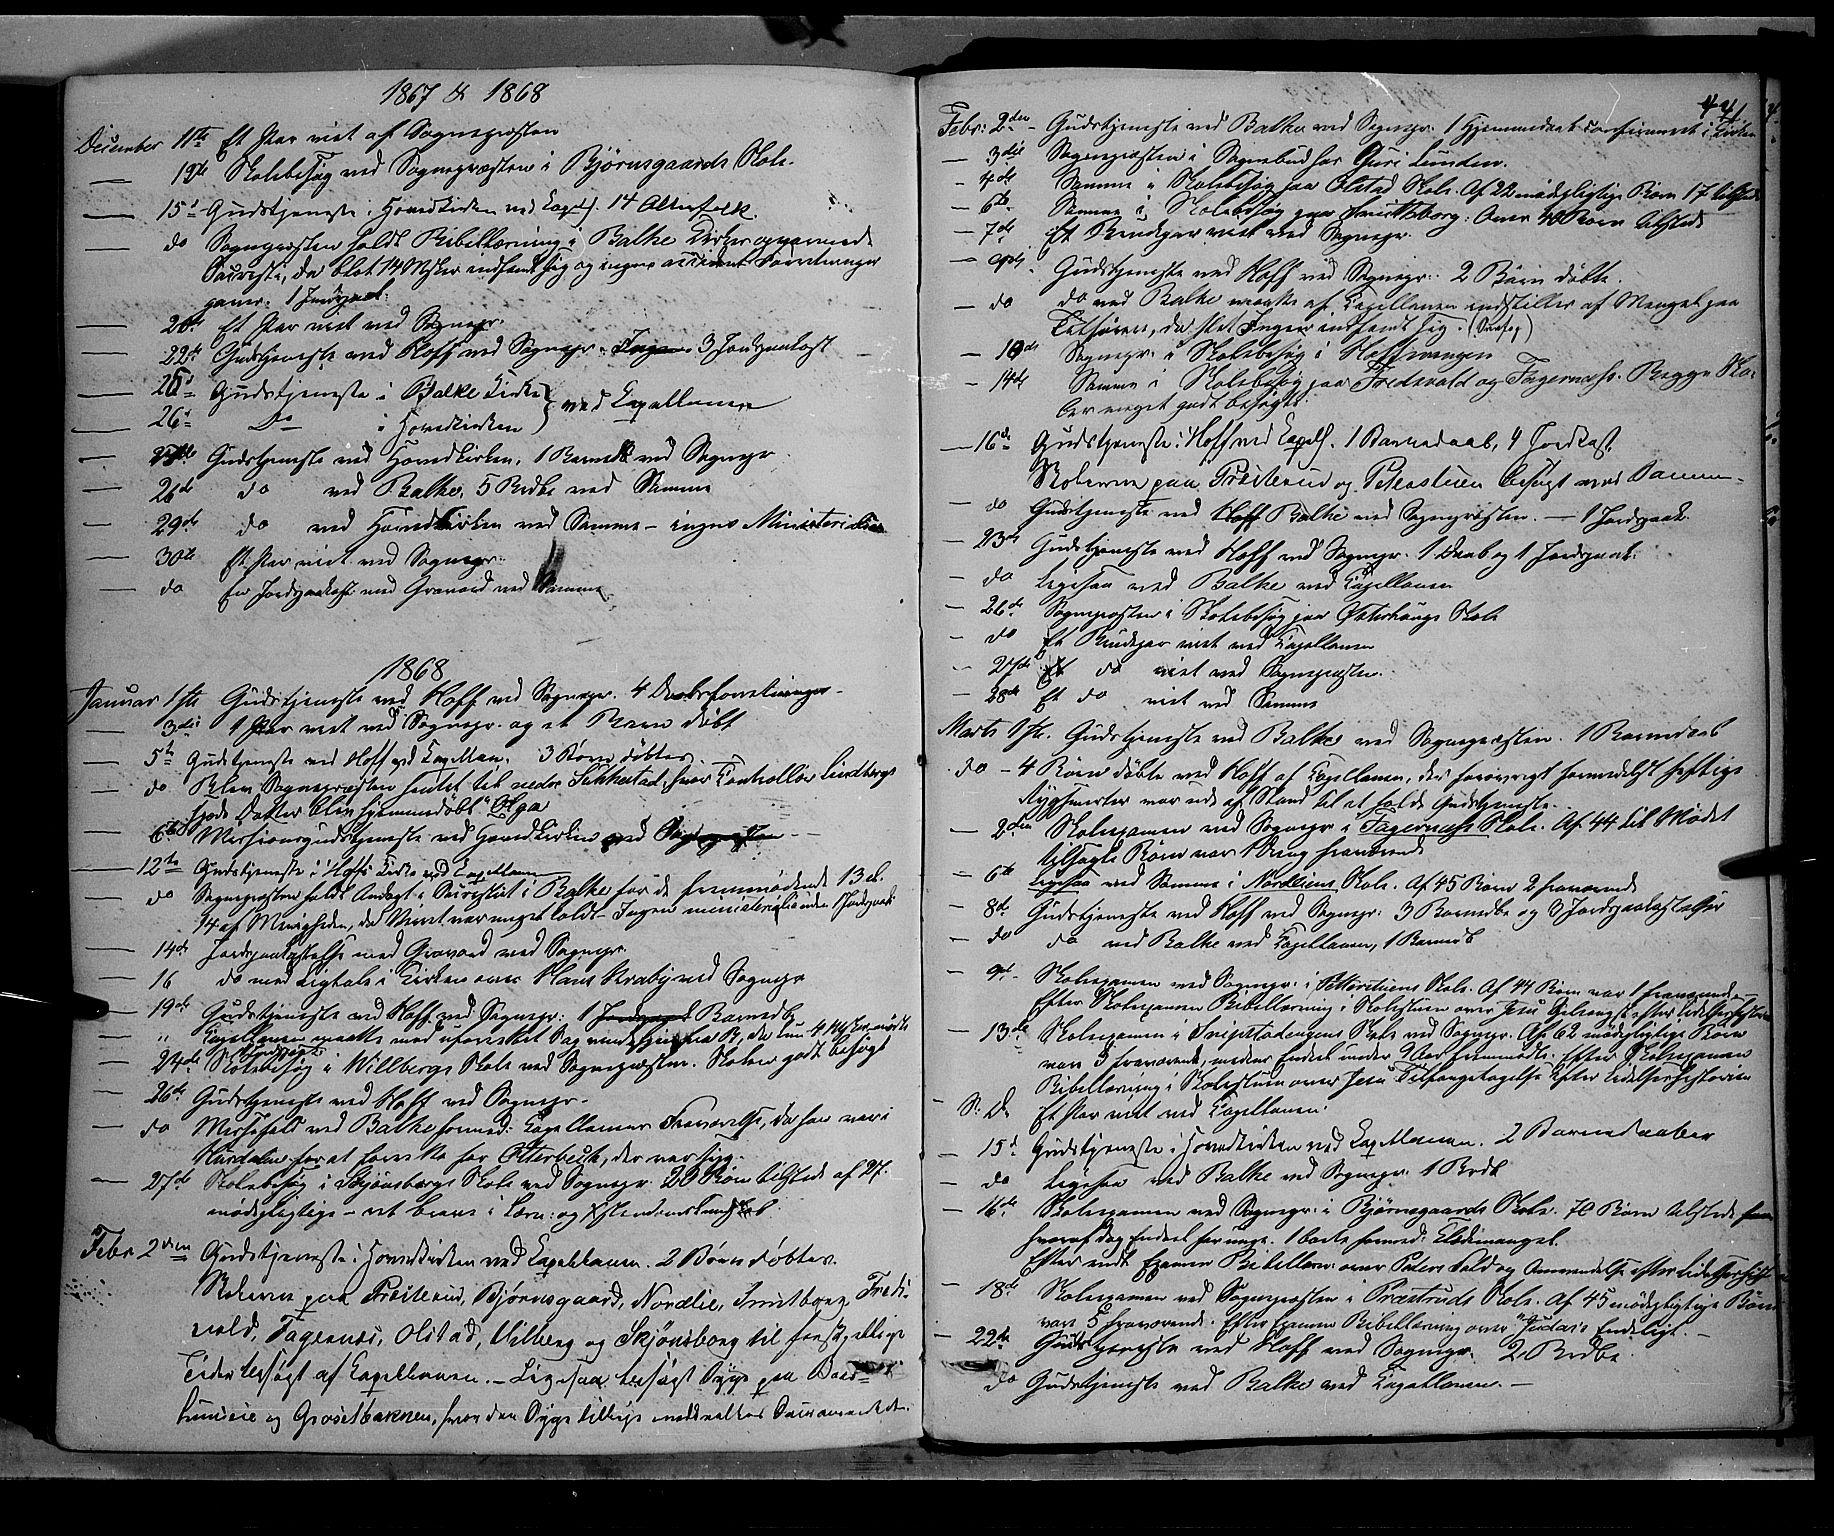 SAH, Østre Toten prestekontor, Ministerialbok nr. 5, 1866-1877, s. 441